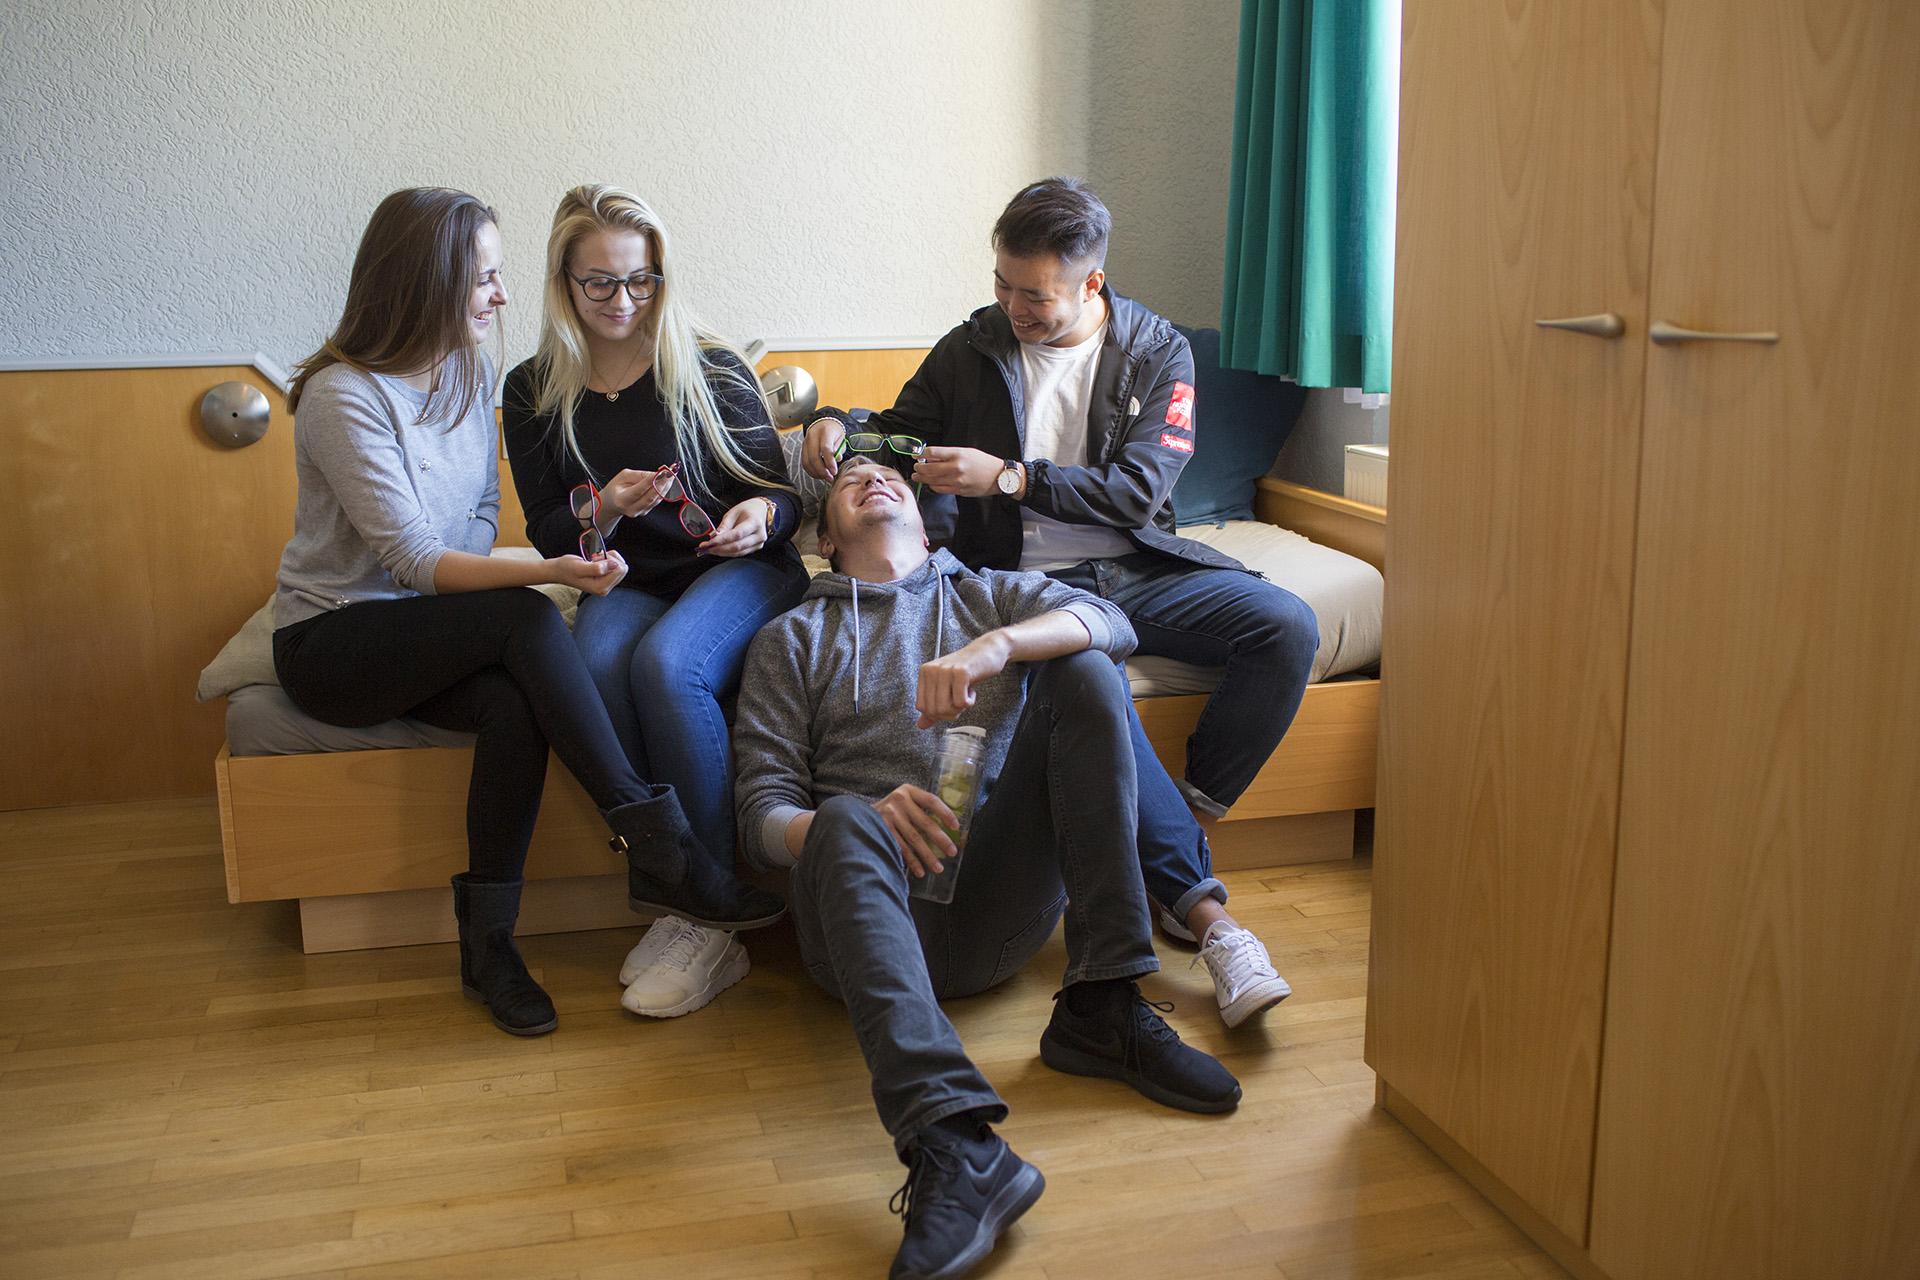 Schüler im Wohnraum